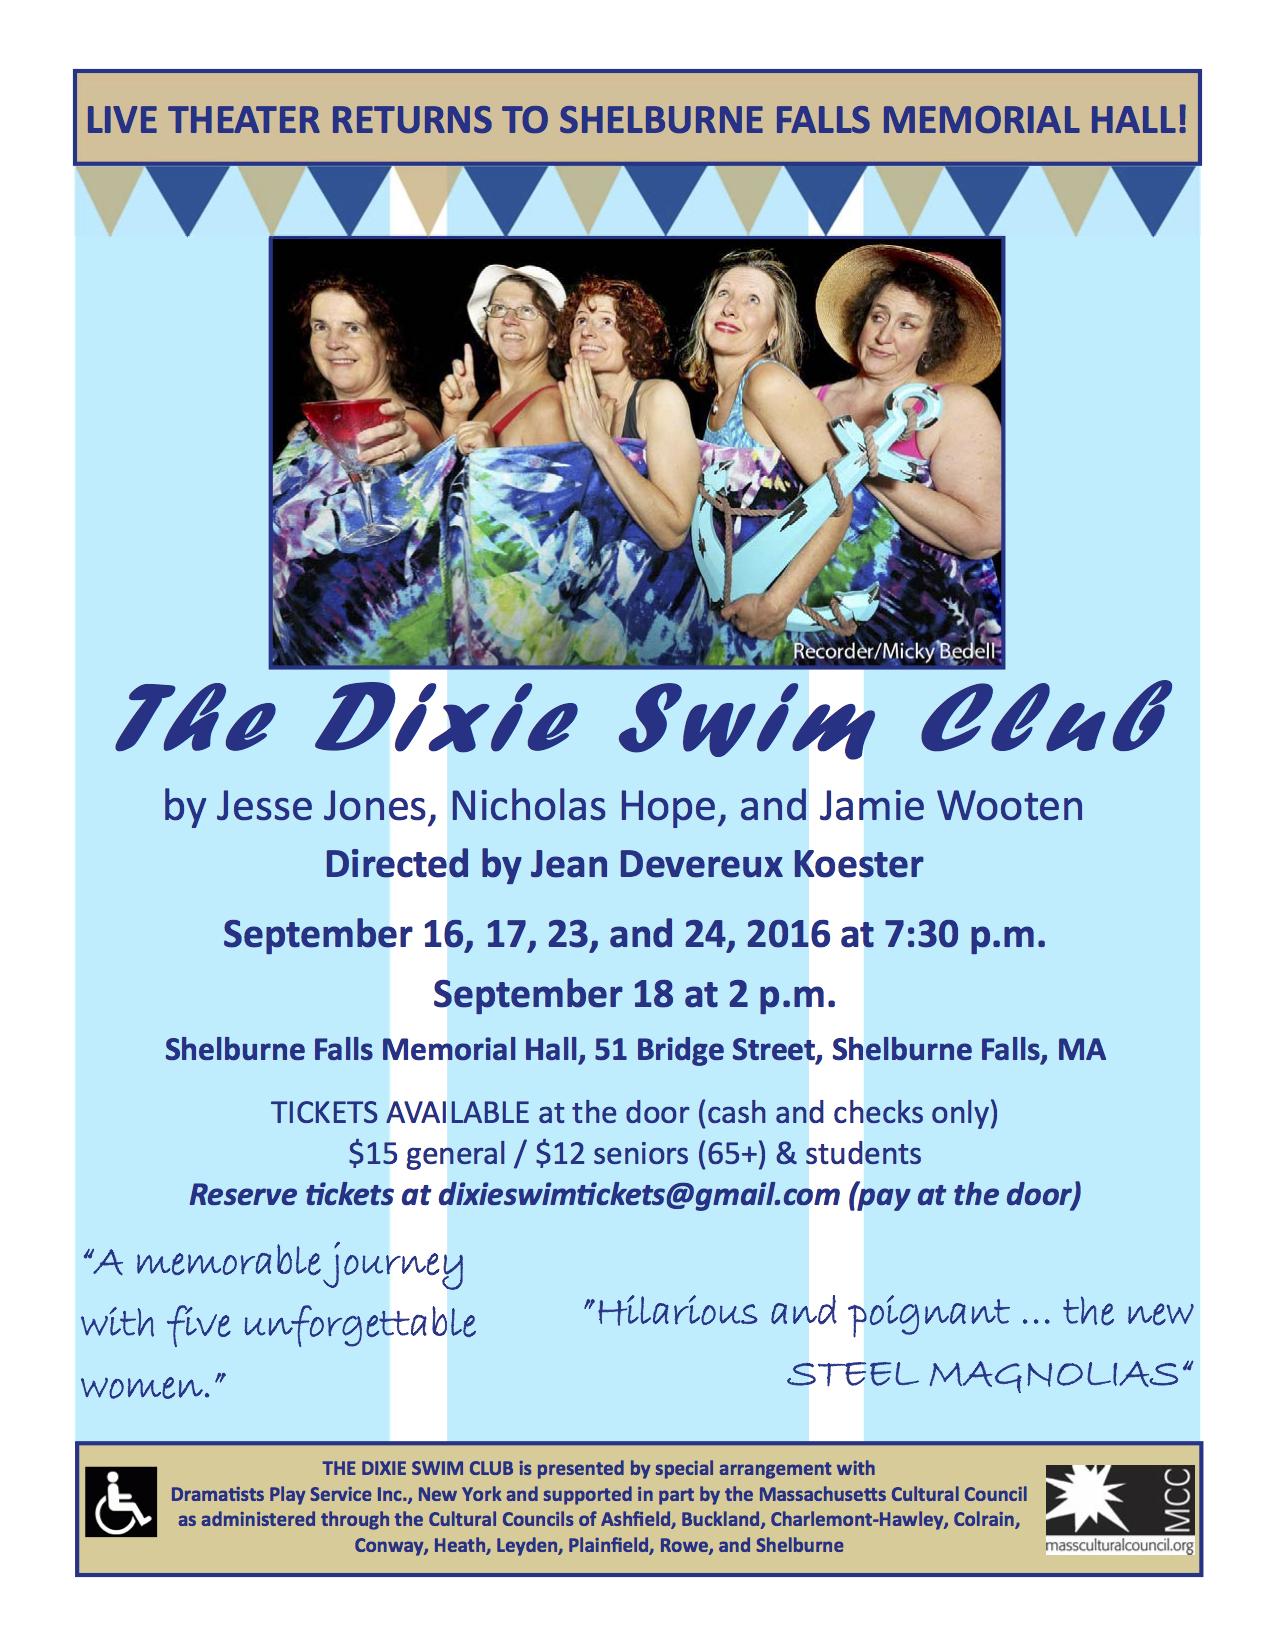 The Dixie Swim Club